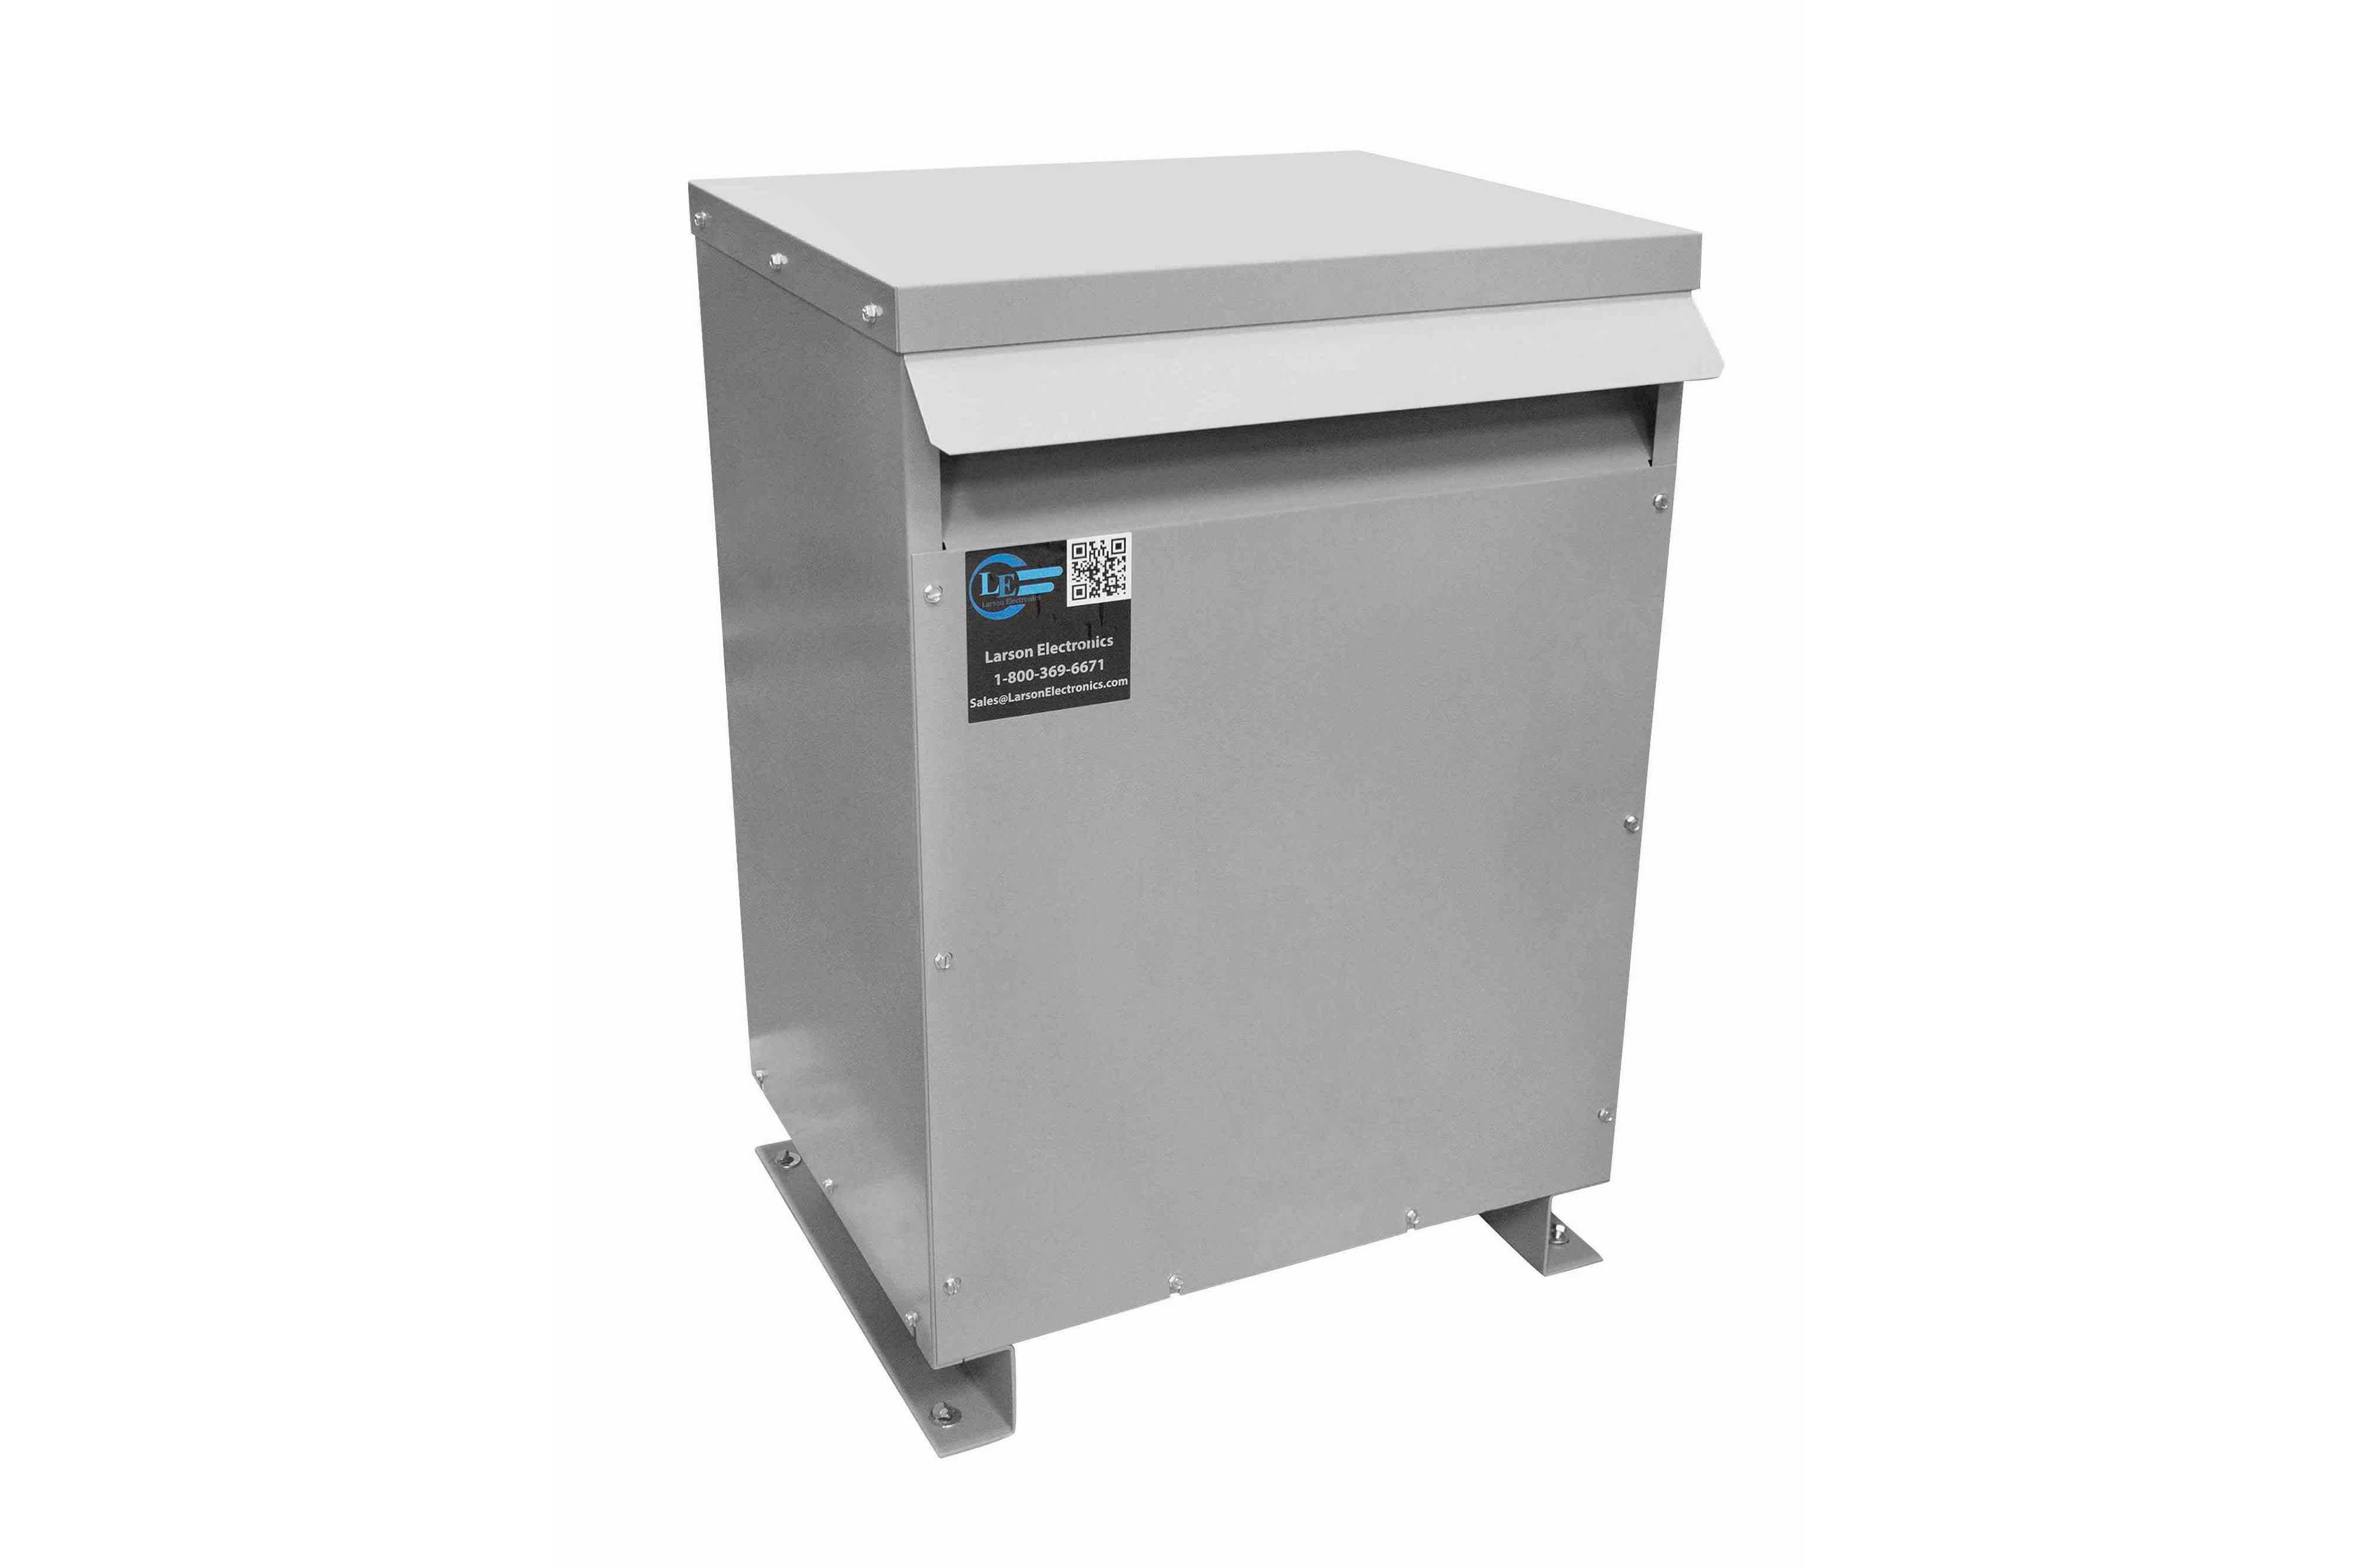 500 kVA 3PH Isolation Transformer, 208V Wye Primary, 208V Delta Secondary, N3R, Ventilated, 60 Hz